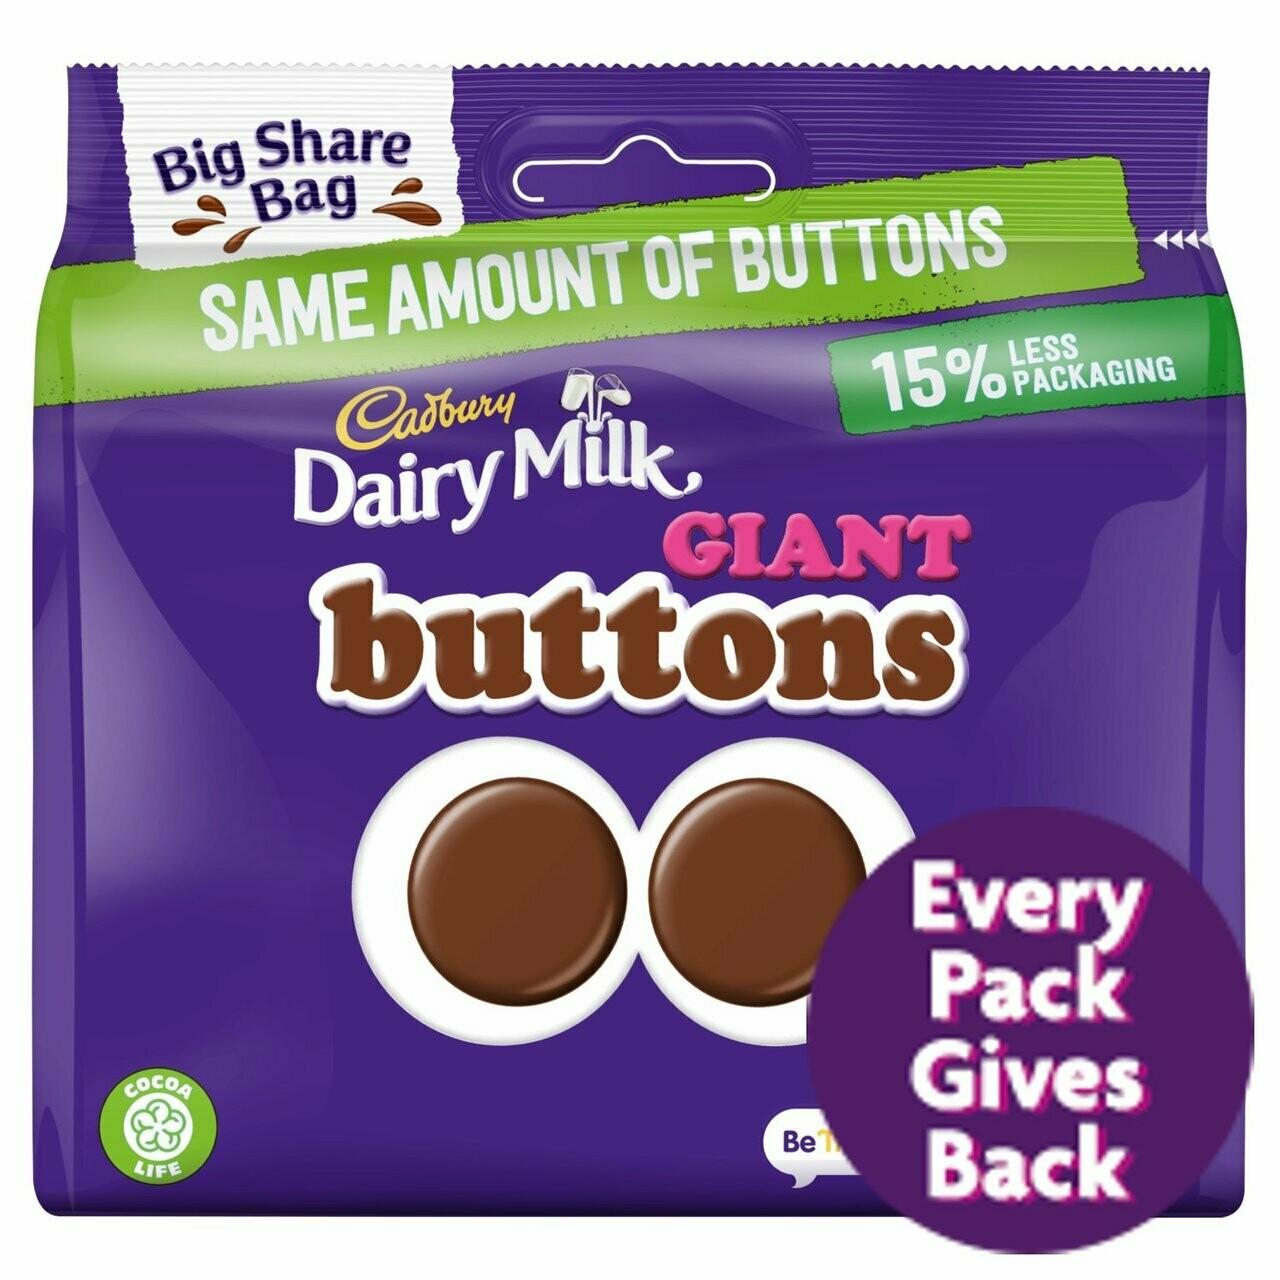 Cadbury Dairy Milk Giant Buttons Big Share Bag 240g